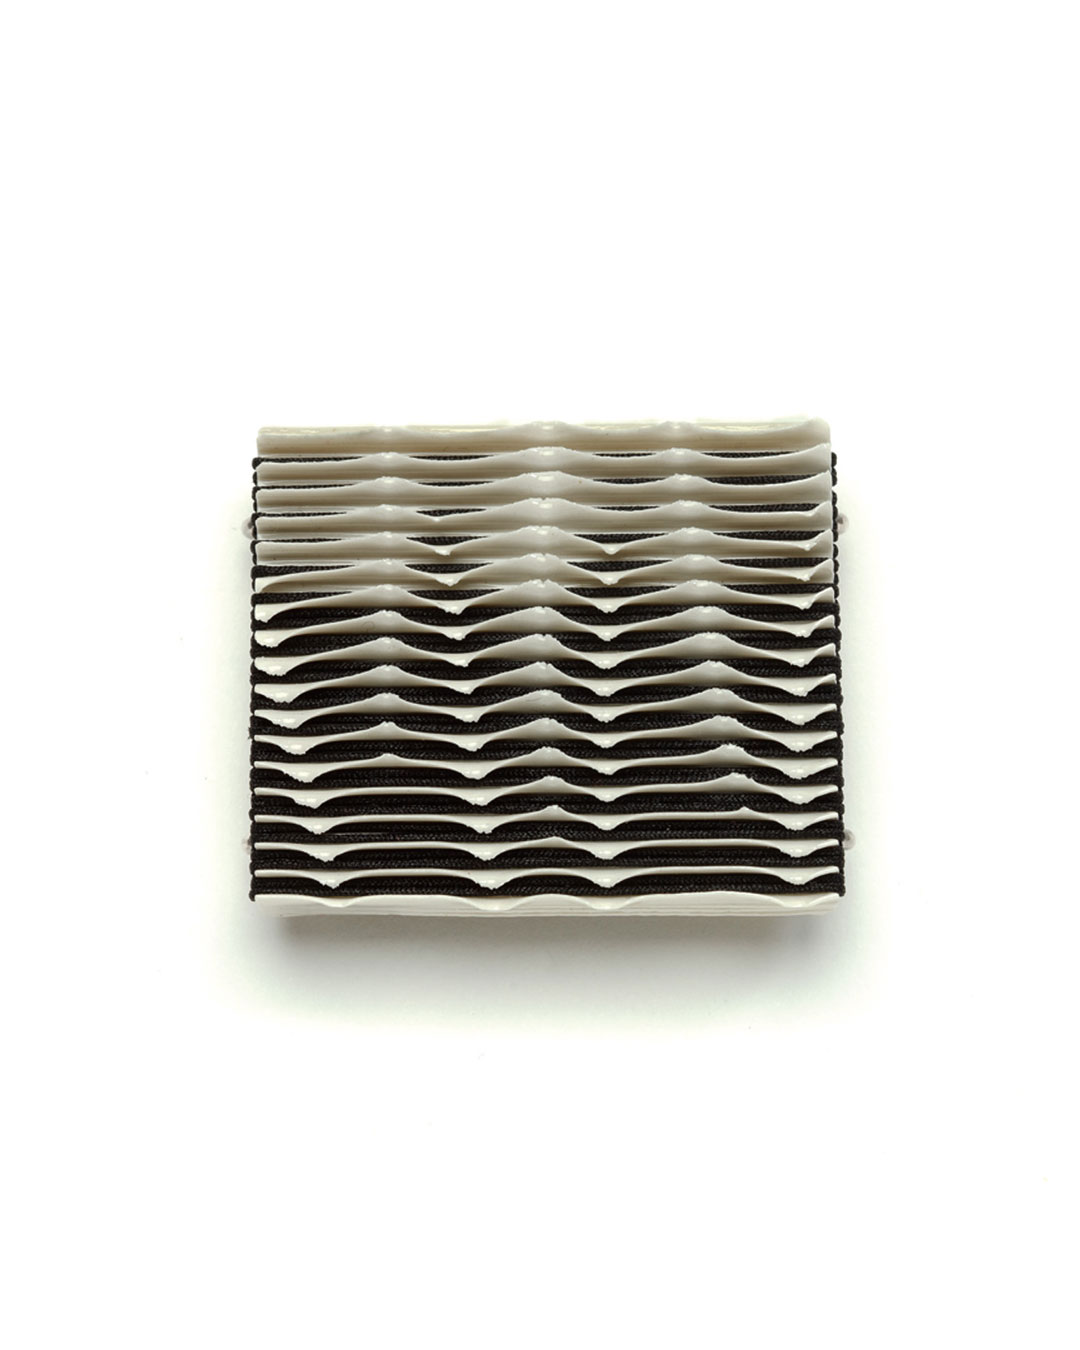 Silke Trekel, Twilight, 2017, brooch; porcelain, silver, thread, 54 x 45 x 9 mm, €775